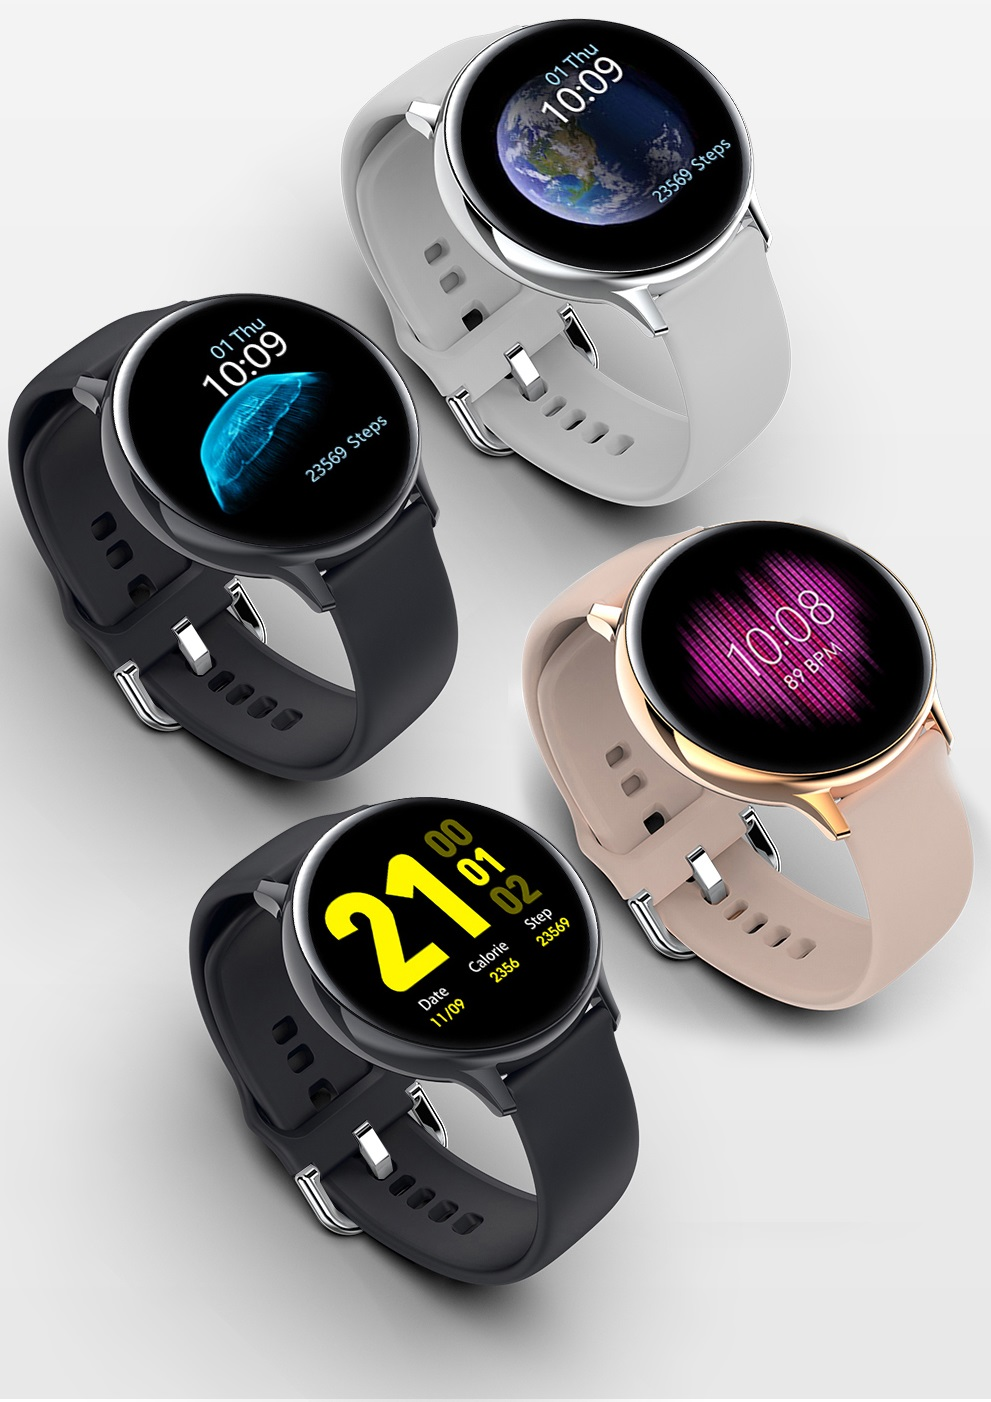 reloj con correa de silicona